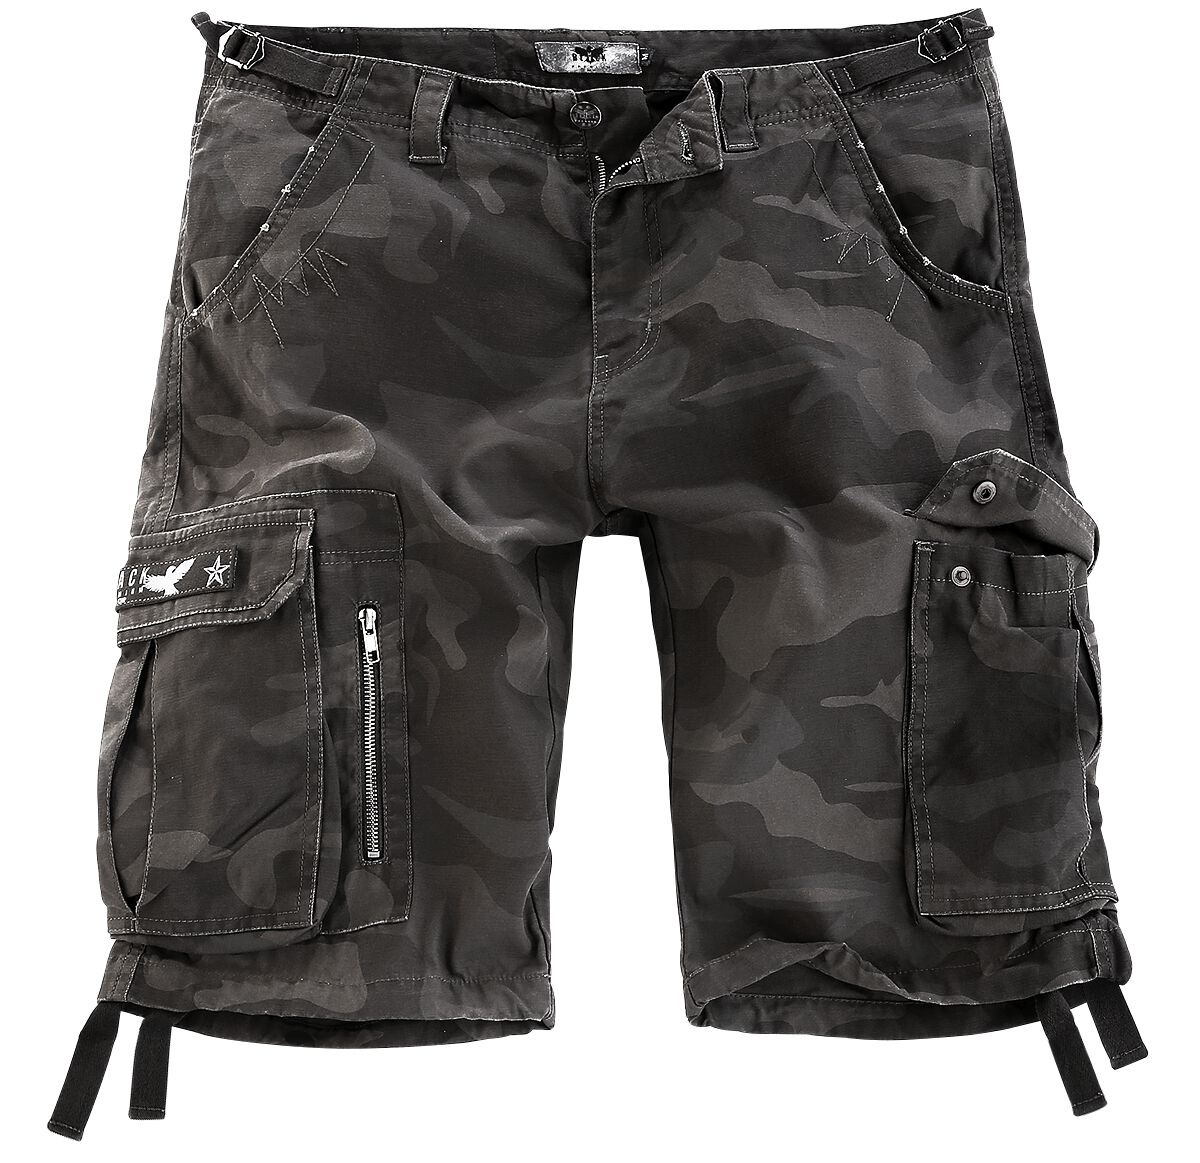 Image of   Black Premium by EMP Army Vintage Shorts Vintage shorts mørk camo